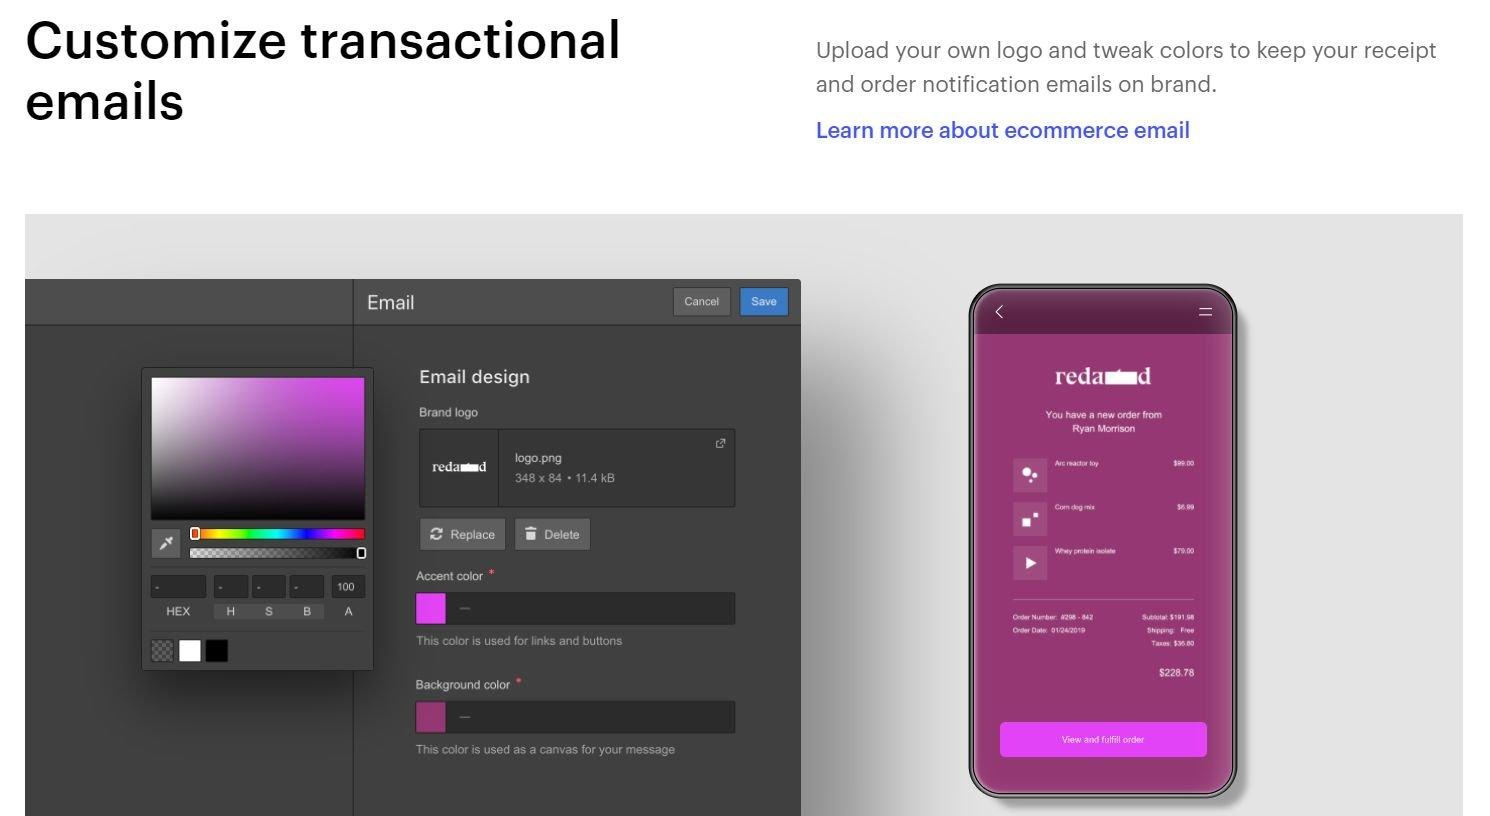 webflow-ecommerce-email design